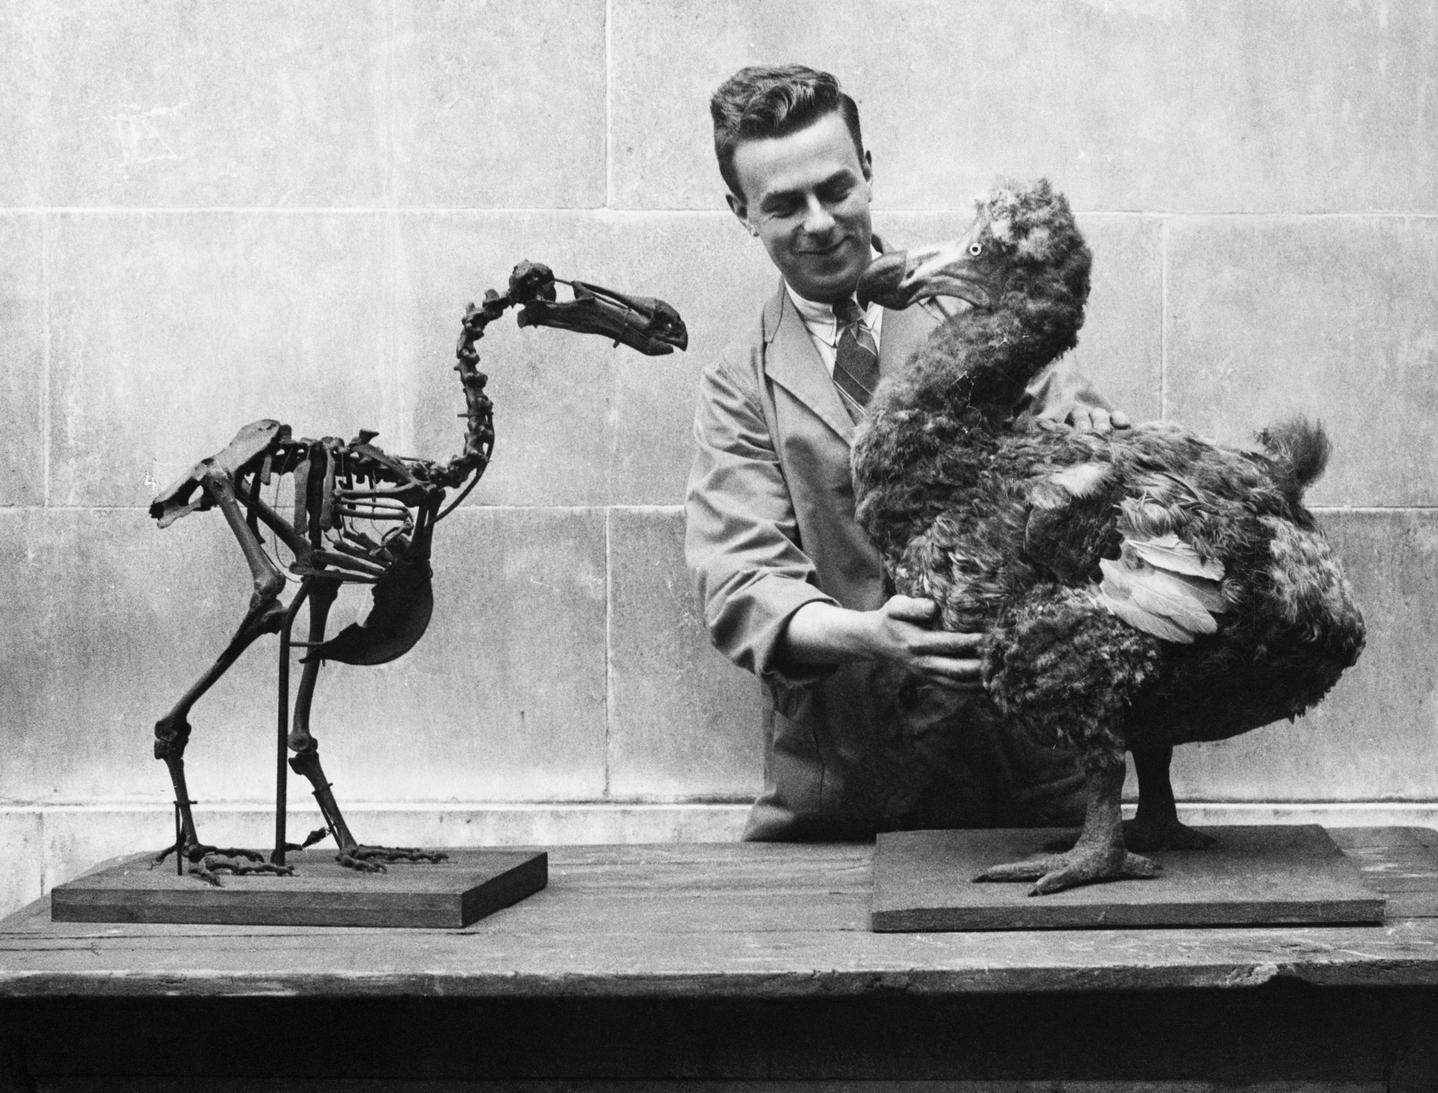 dodo-archiv-madar-bird-wales-museum-muzeum-csontvaz-skeleton-gettyimages1.jpg